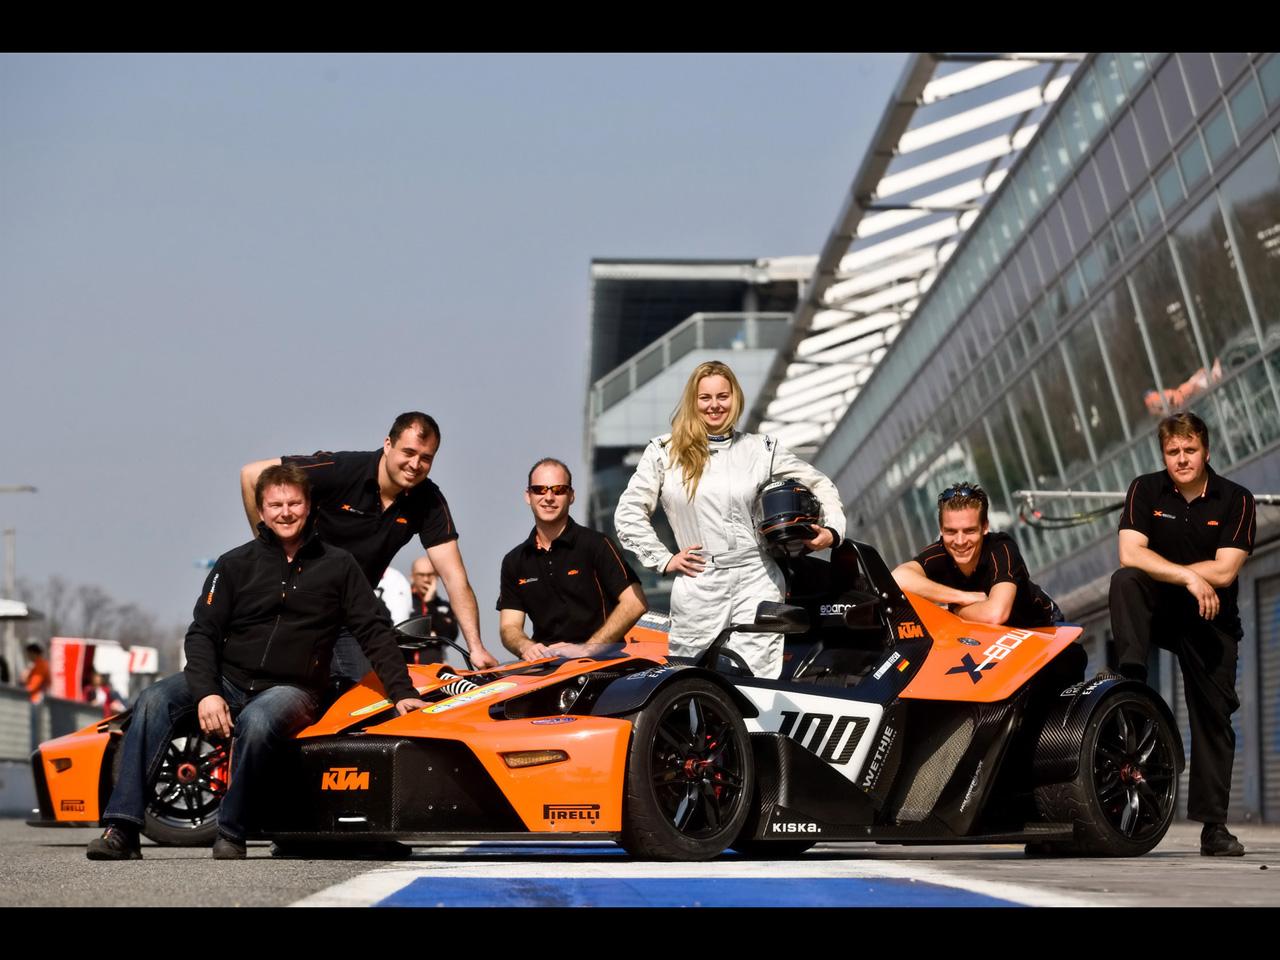 2008 KTM X Bow Racing Debut   Team   1280x960   Wallpaper 1280x960